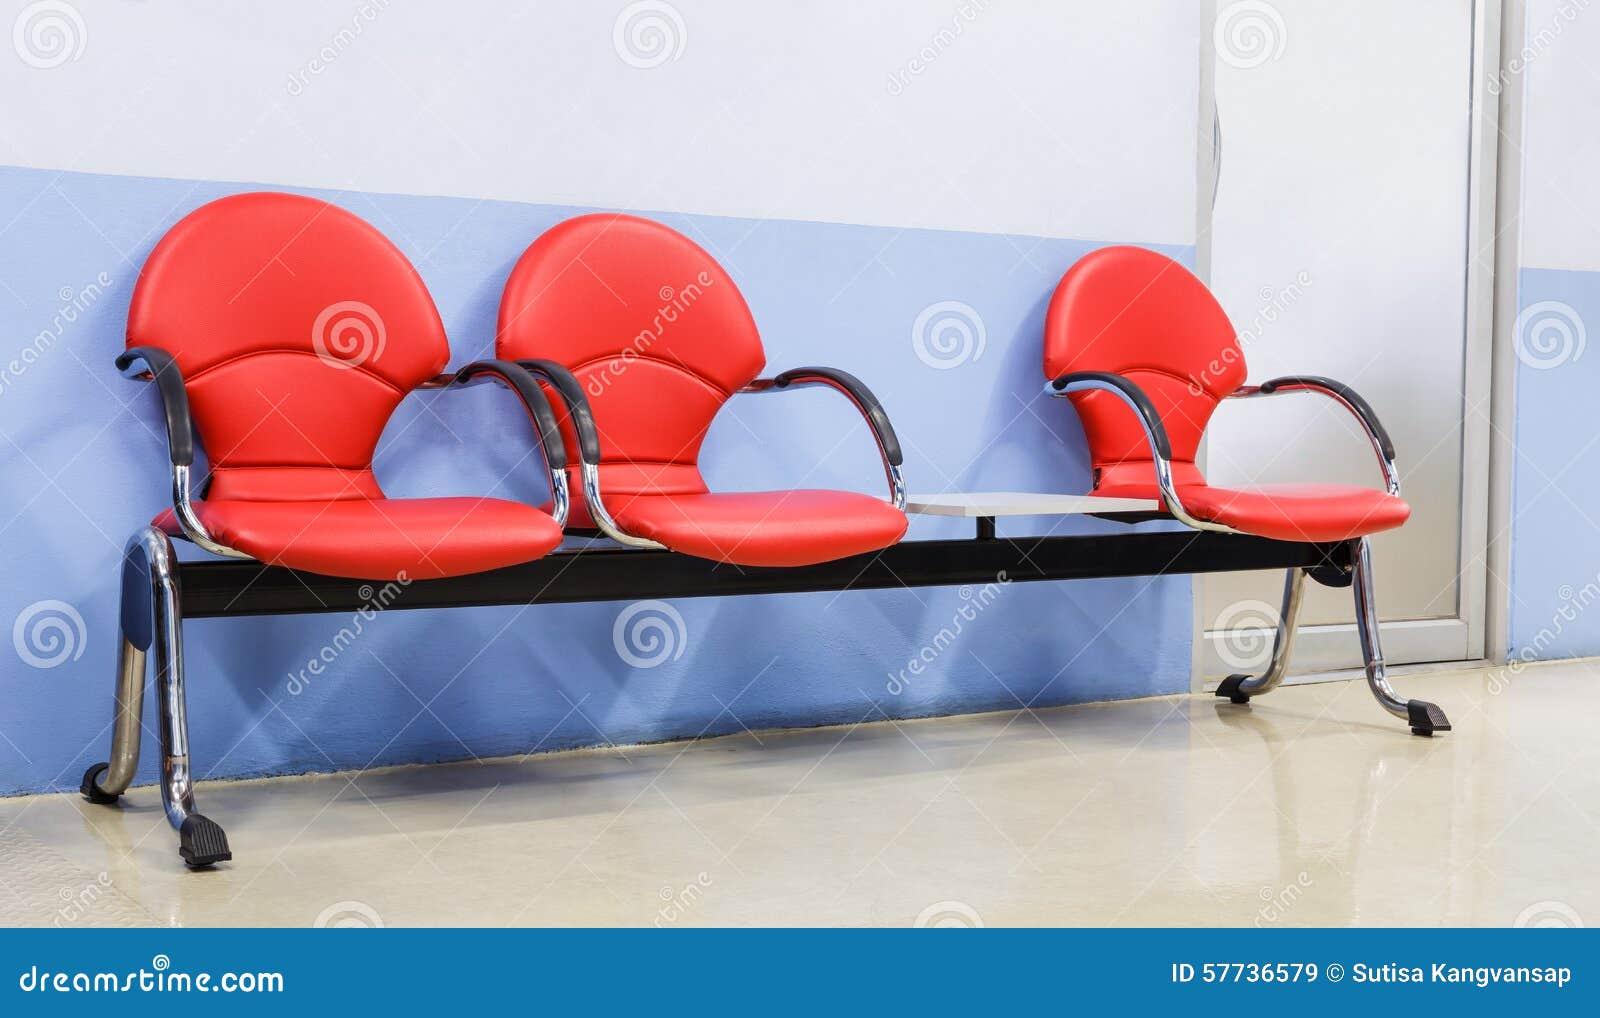 Red Modern Seat Stock Photo Image 57736579